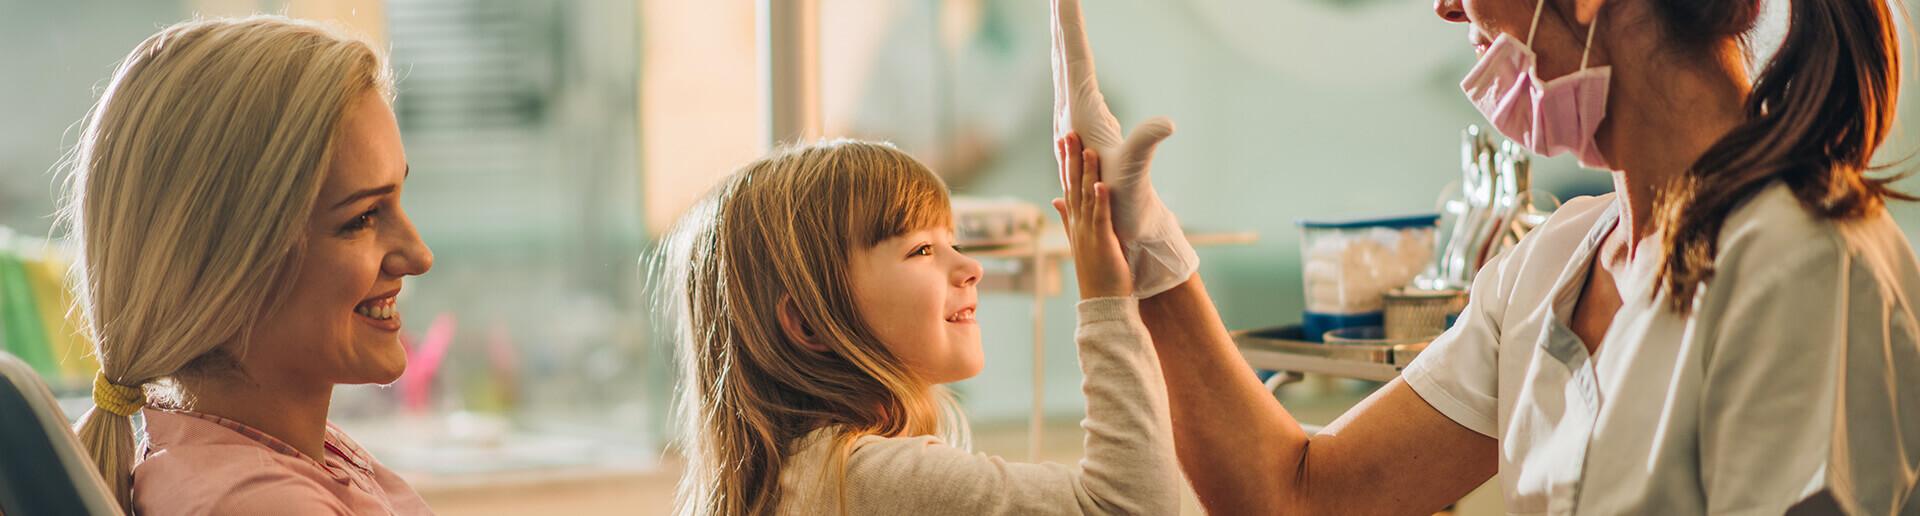 smiling mother holding her little girl as she high-fives her dentist